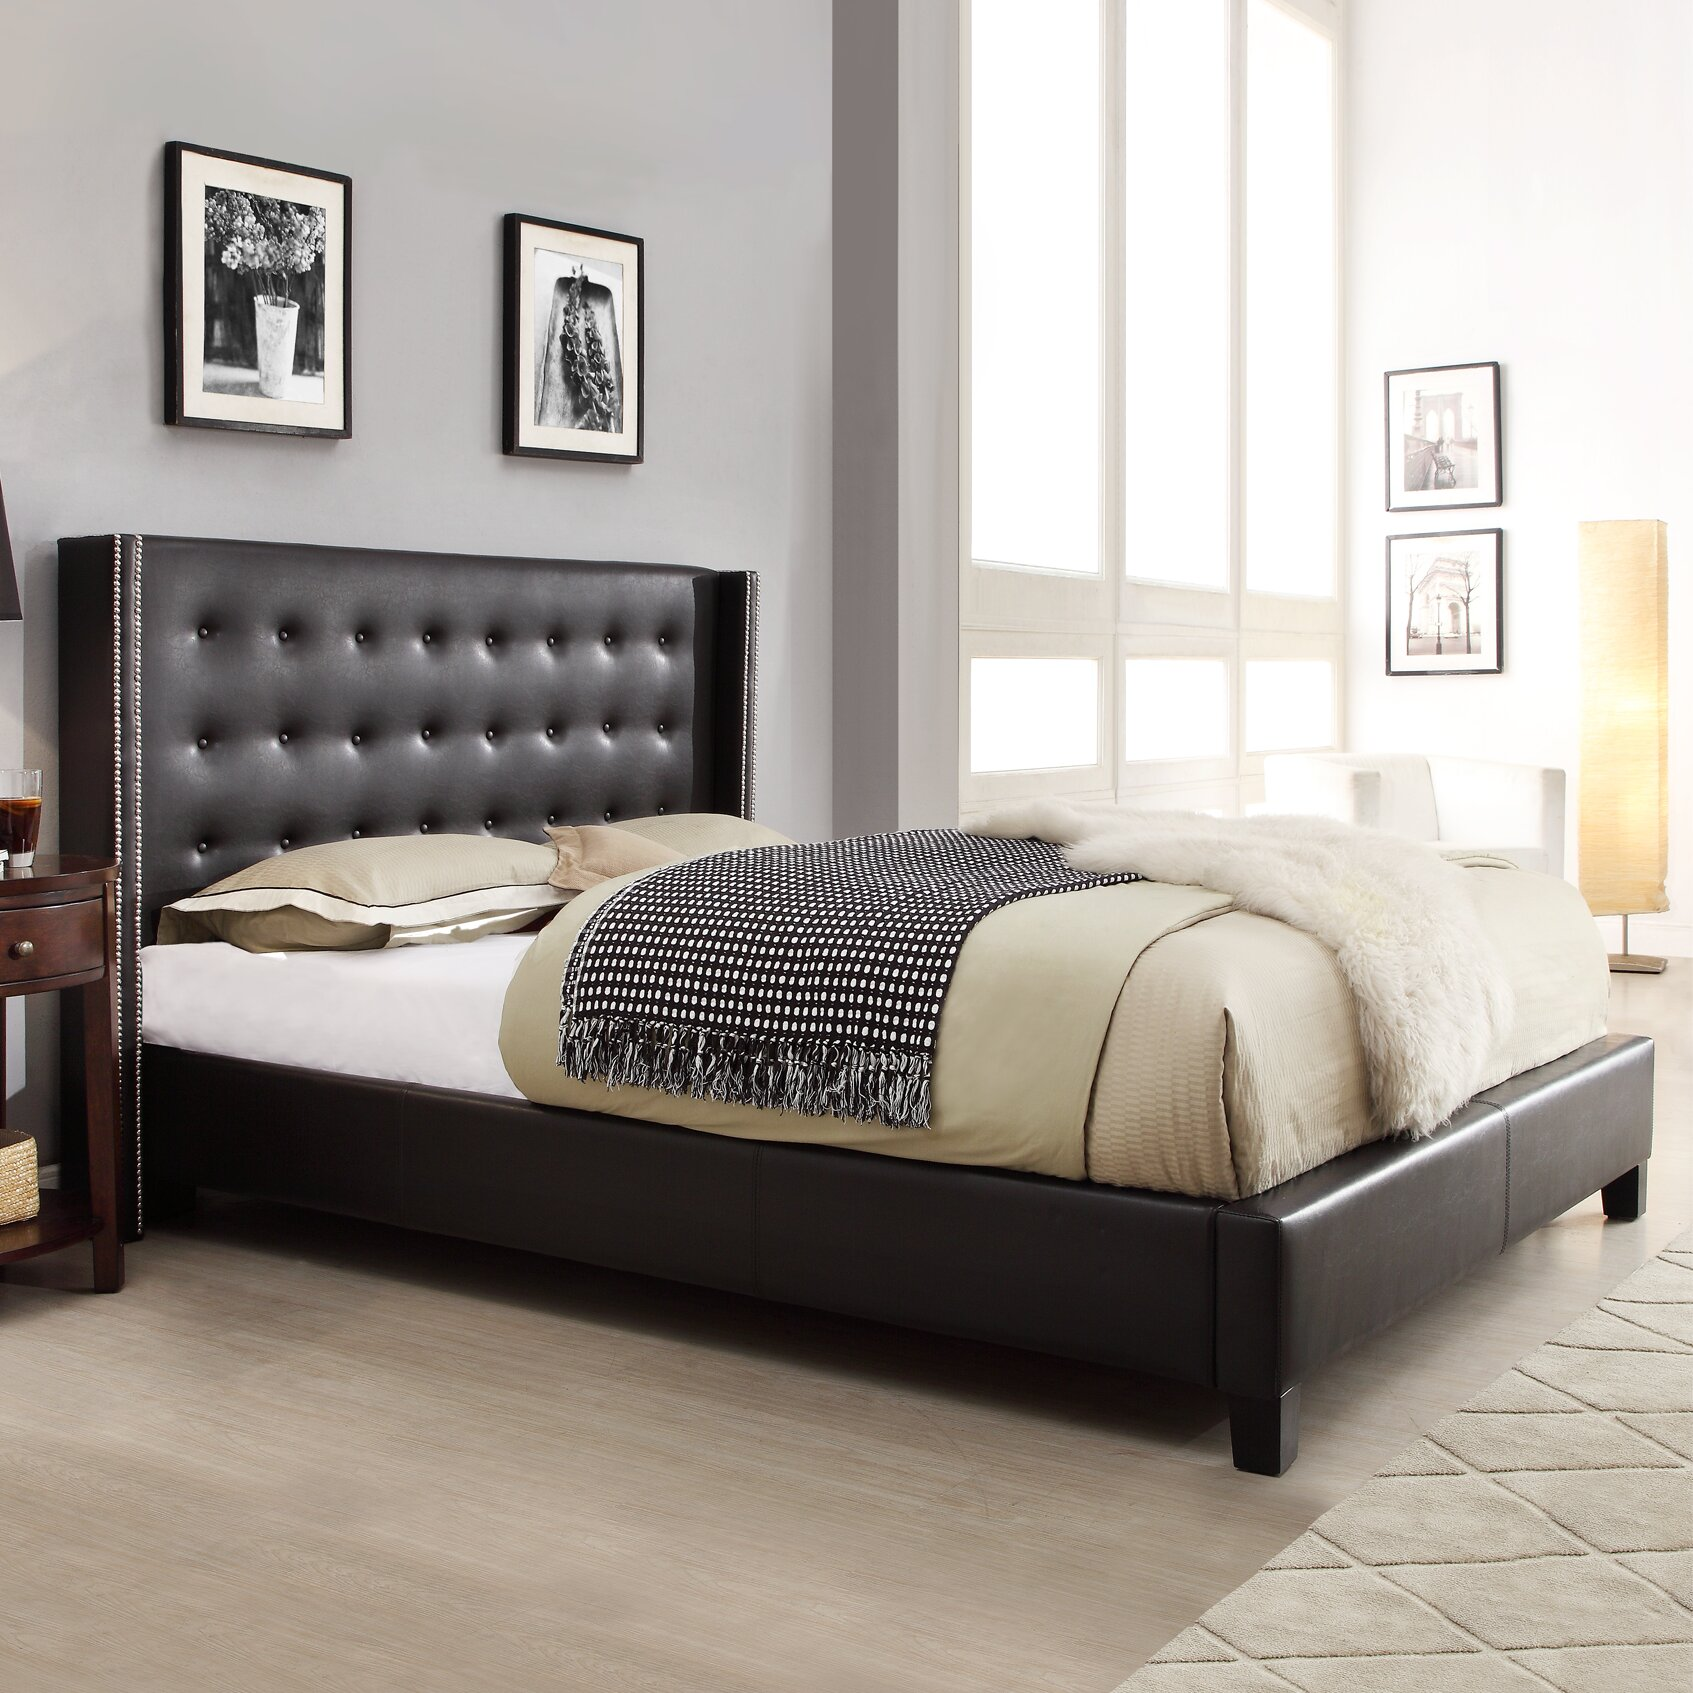 Kingstown Bedroom Furniture Kingstown Home Mackenna Upholstered Platform Bed Reviews Wayfair